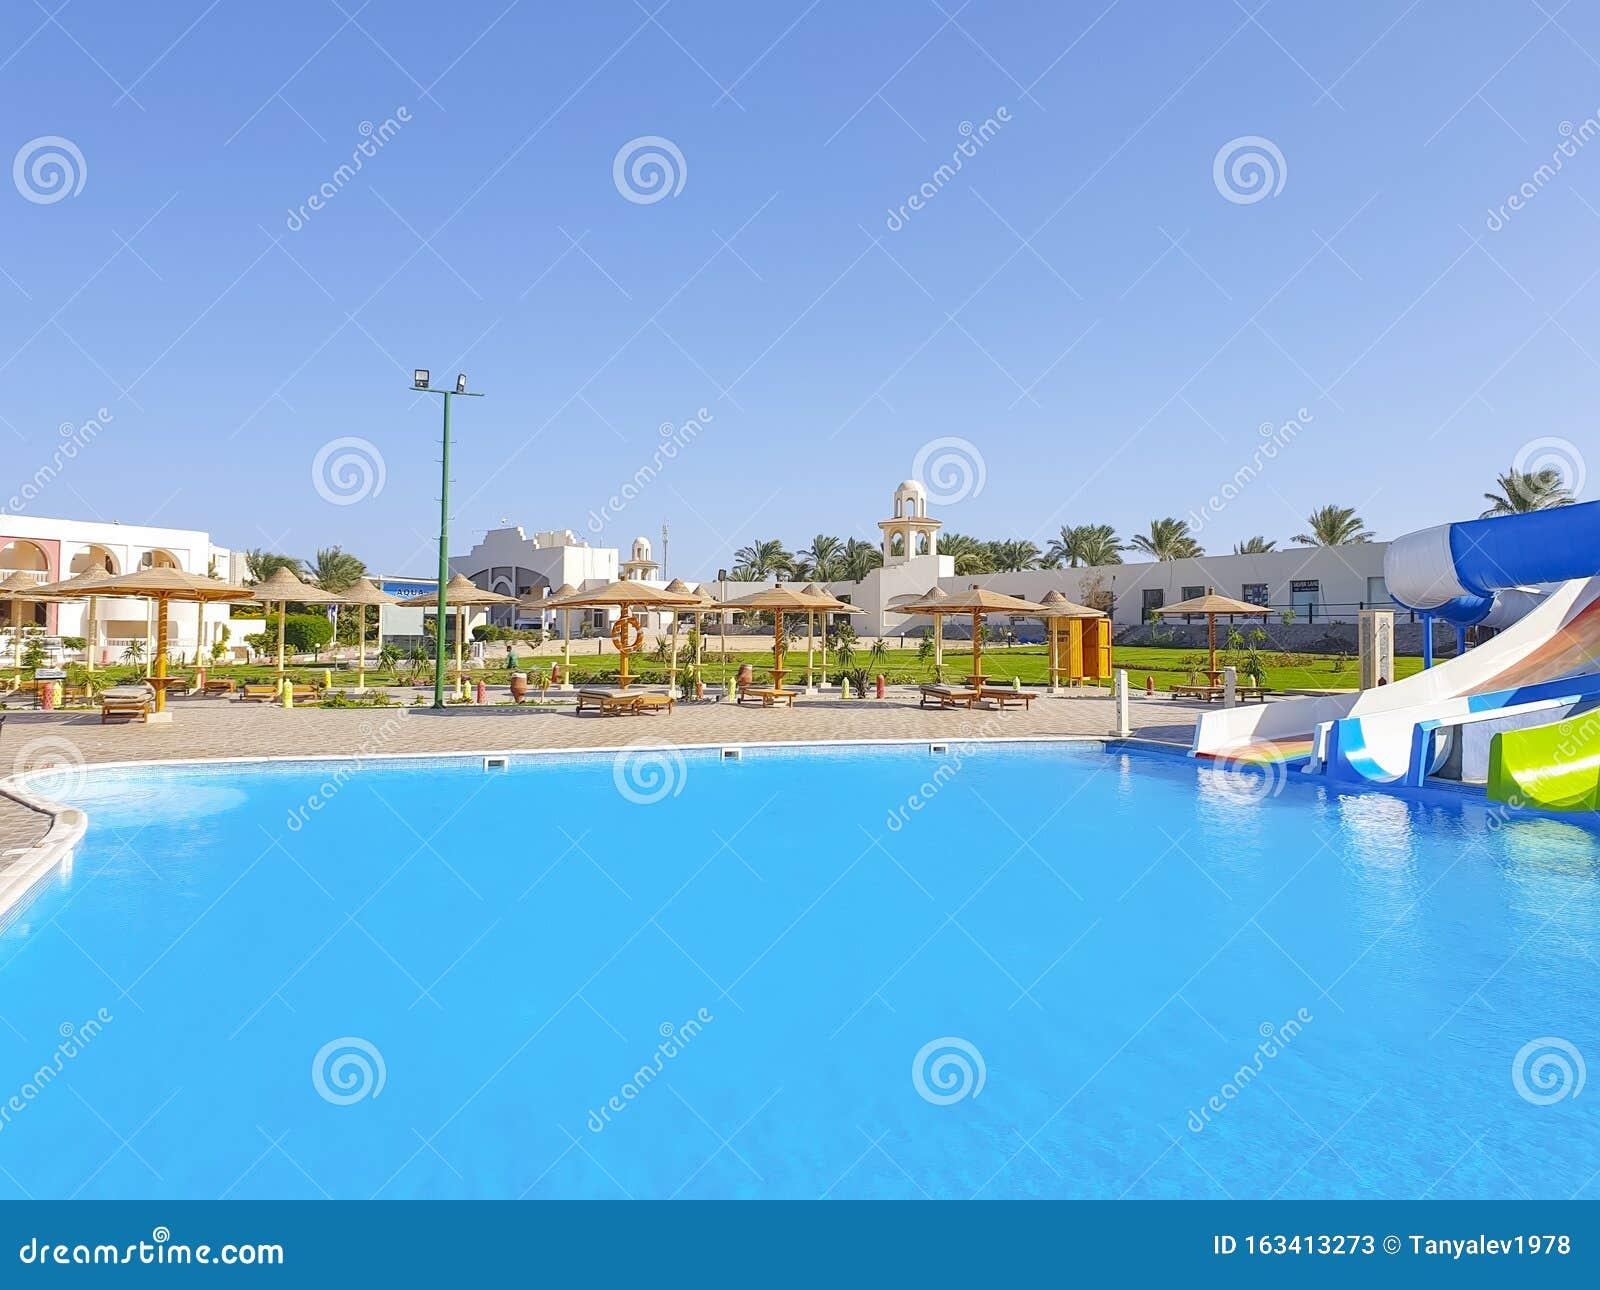 November 1 2019 Egypt Hurghada Water Slides At The Hotel Long Beach Resort Editorial Stock Photo Image Of Destinations November 163413273